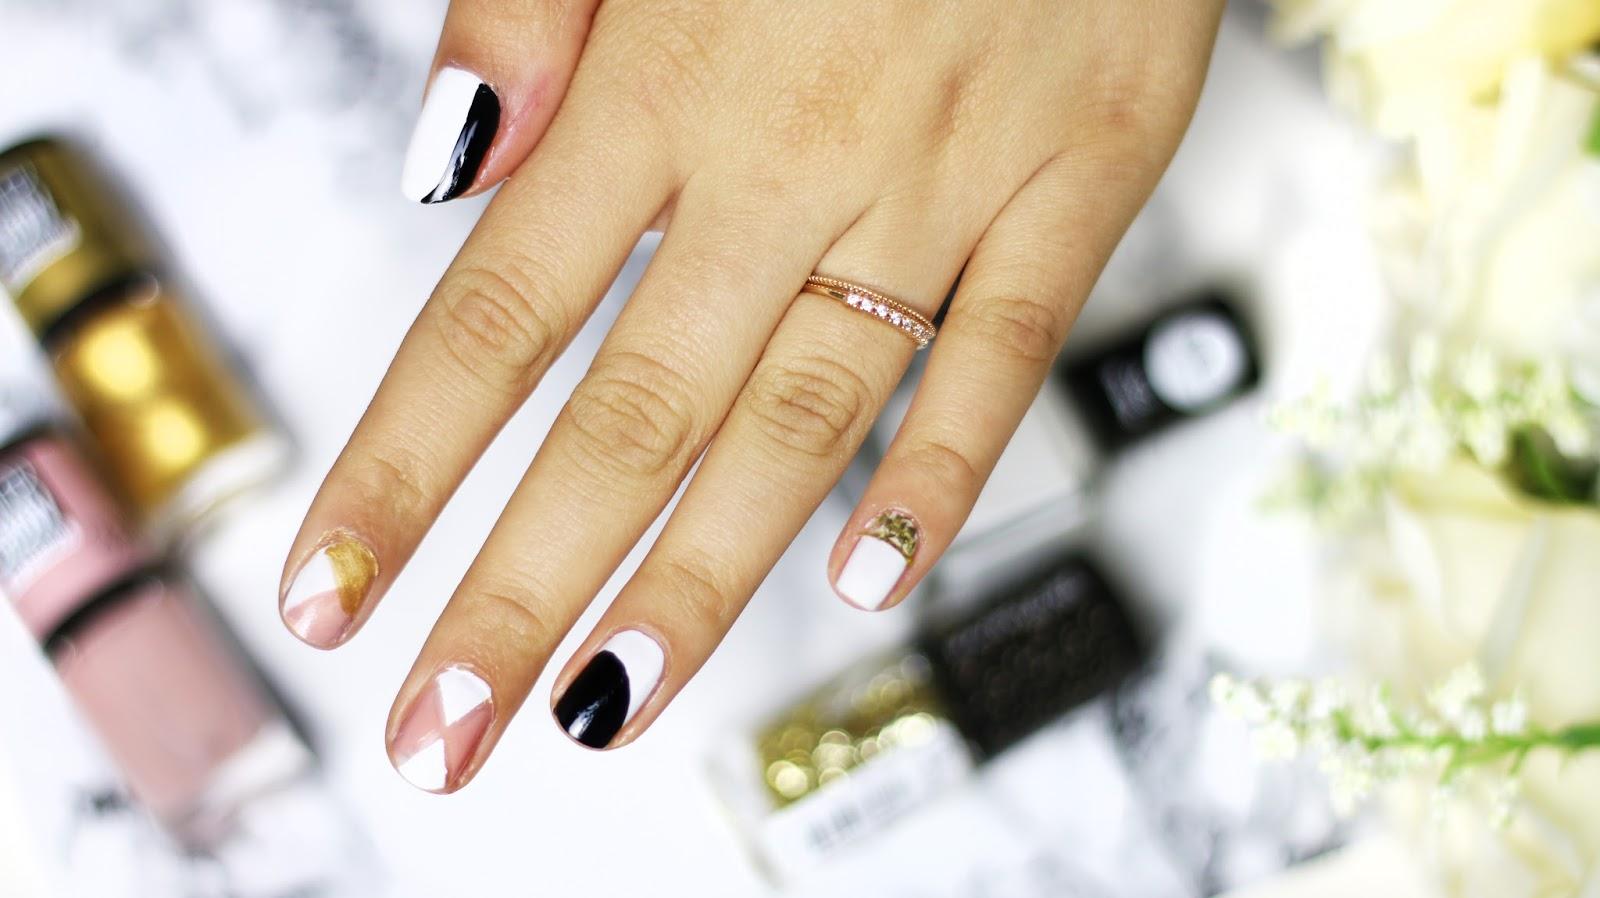 5 einfache schnelle nagel designs sanny kaur. Black Bedroom Furniture Sets. Home Design Ideas